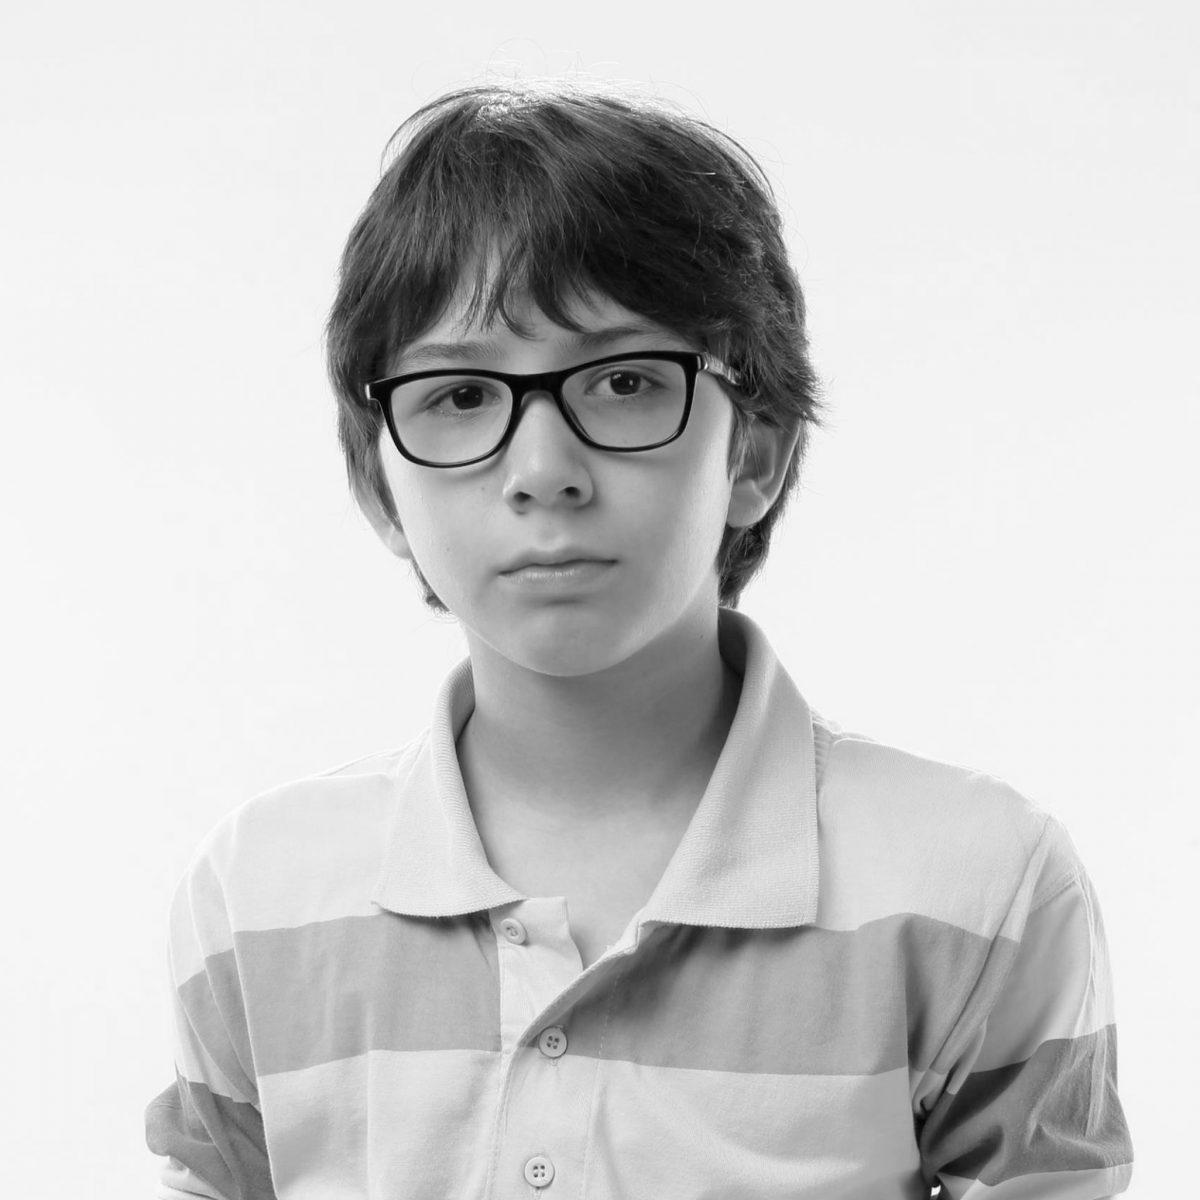 Sebastián Zamudio